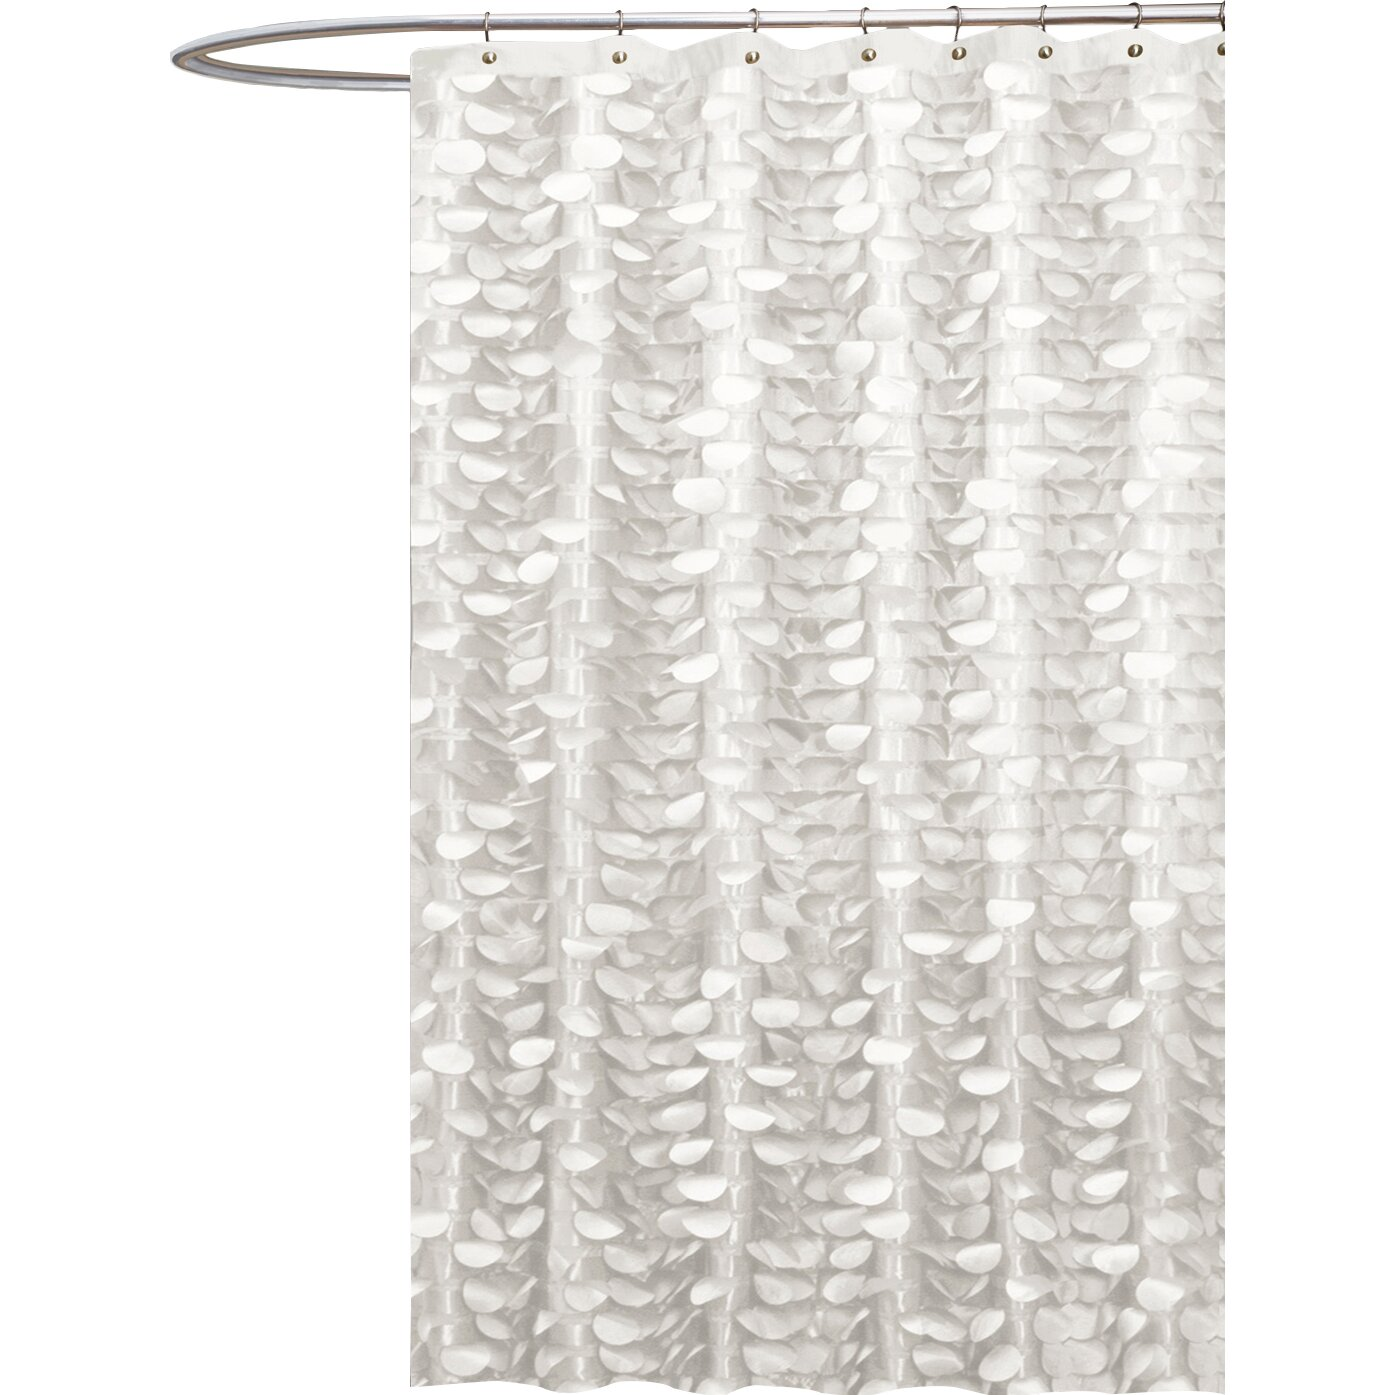 Lush Decor Georgia Shower Curtain Wayfair